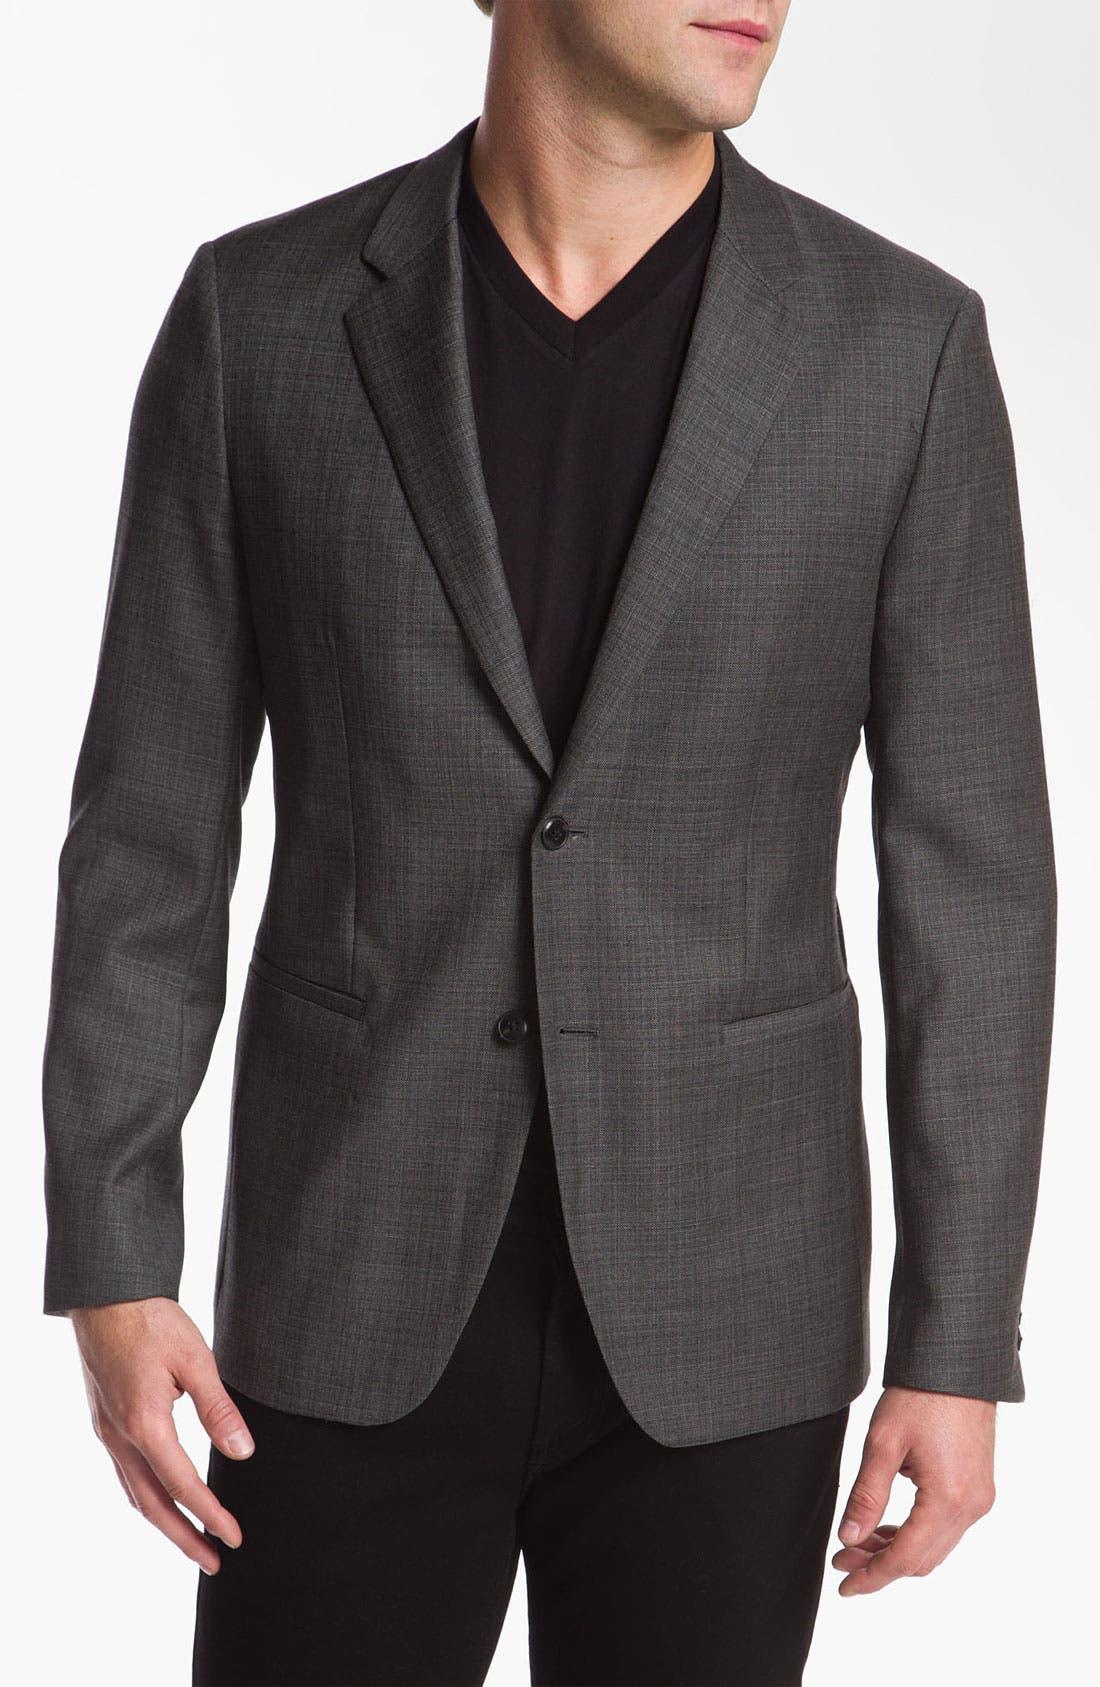 Main Image - Theory 'Kris LaJoux' Blazer